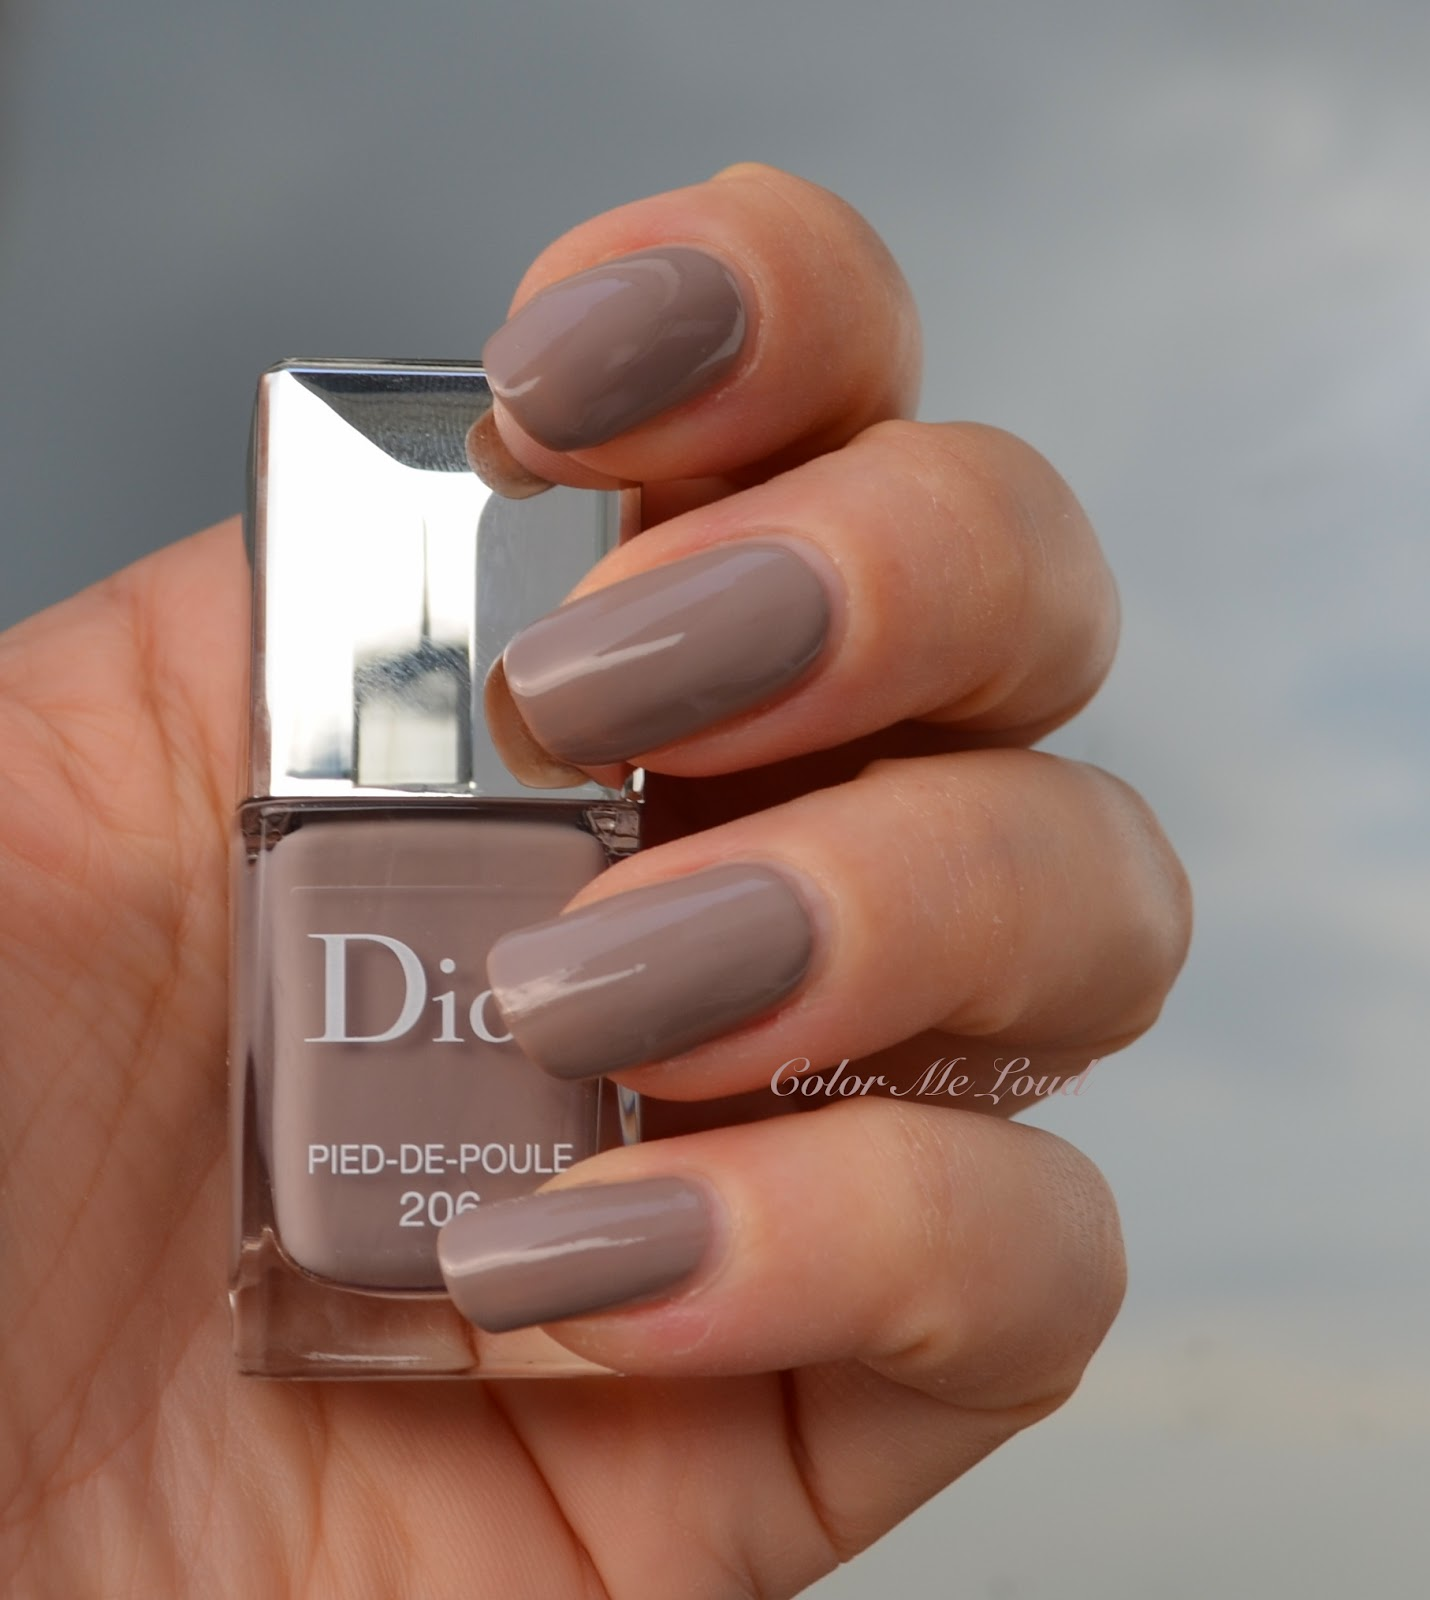 Dior Vernis #206 Pied-de-Poule, #796 Carre Bleu and #853 Massai from ...